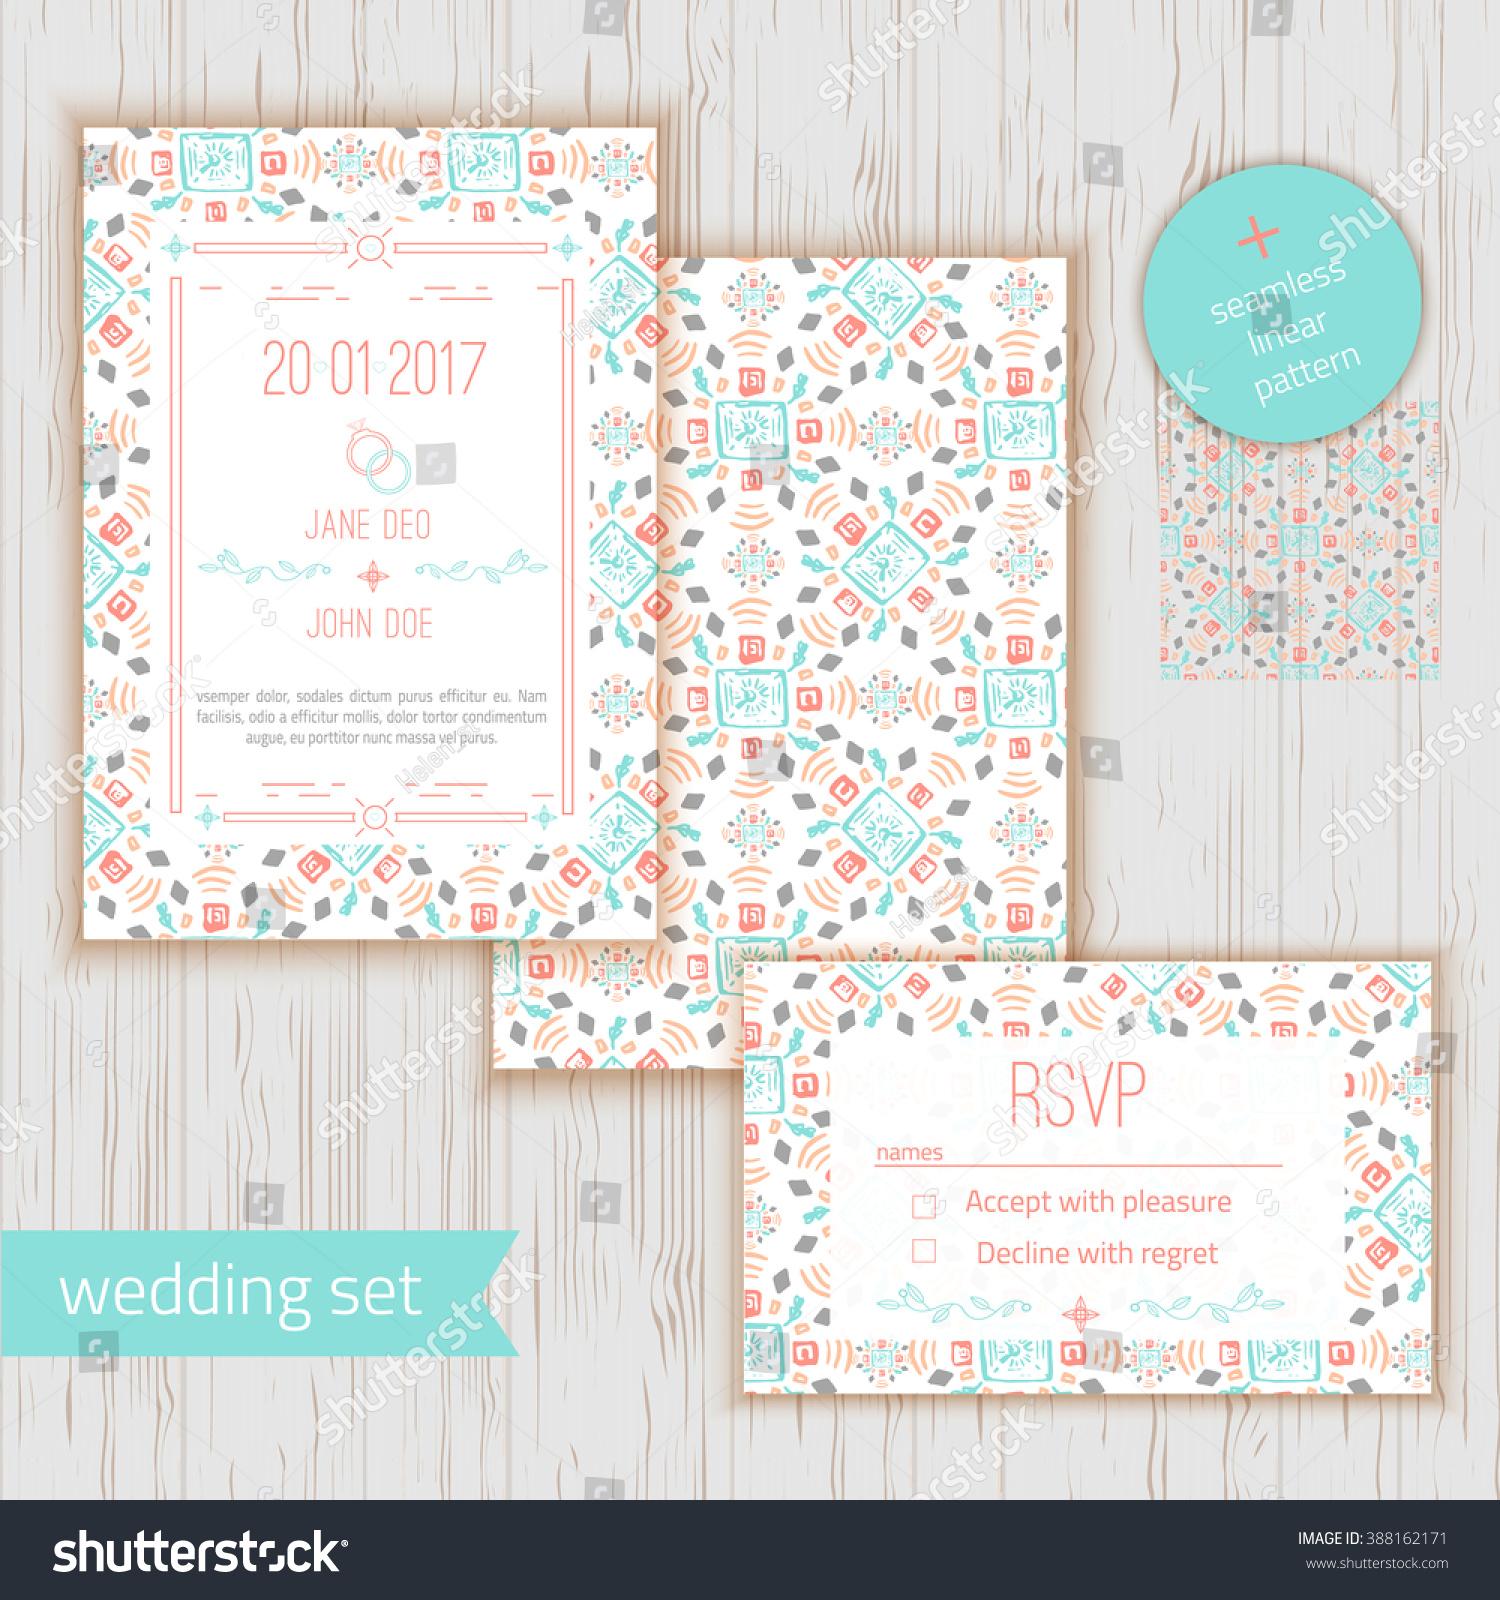 Stylish Geometric Save Date Wedding Invitation Stock Vector ...